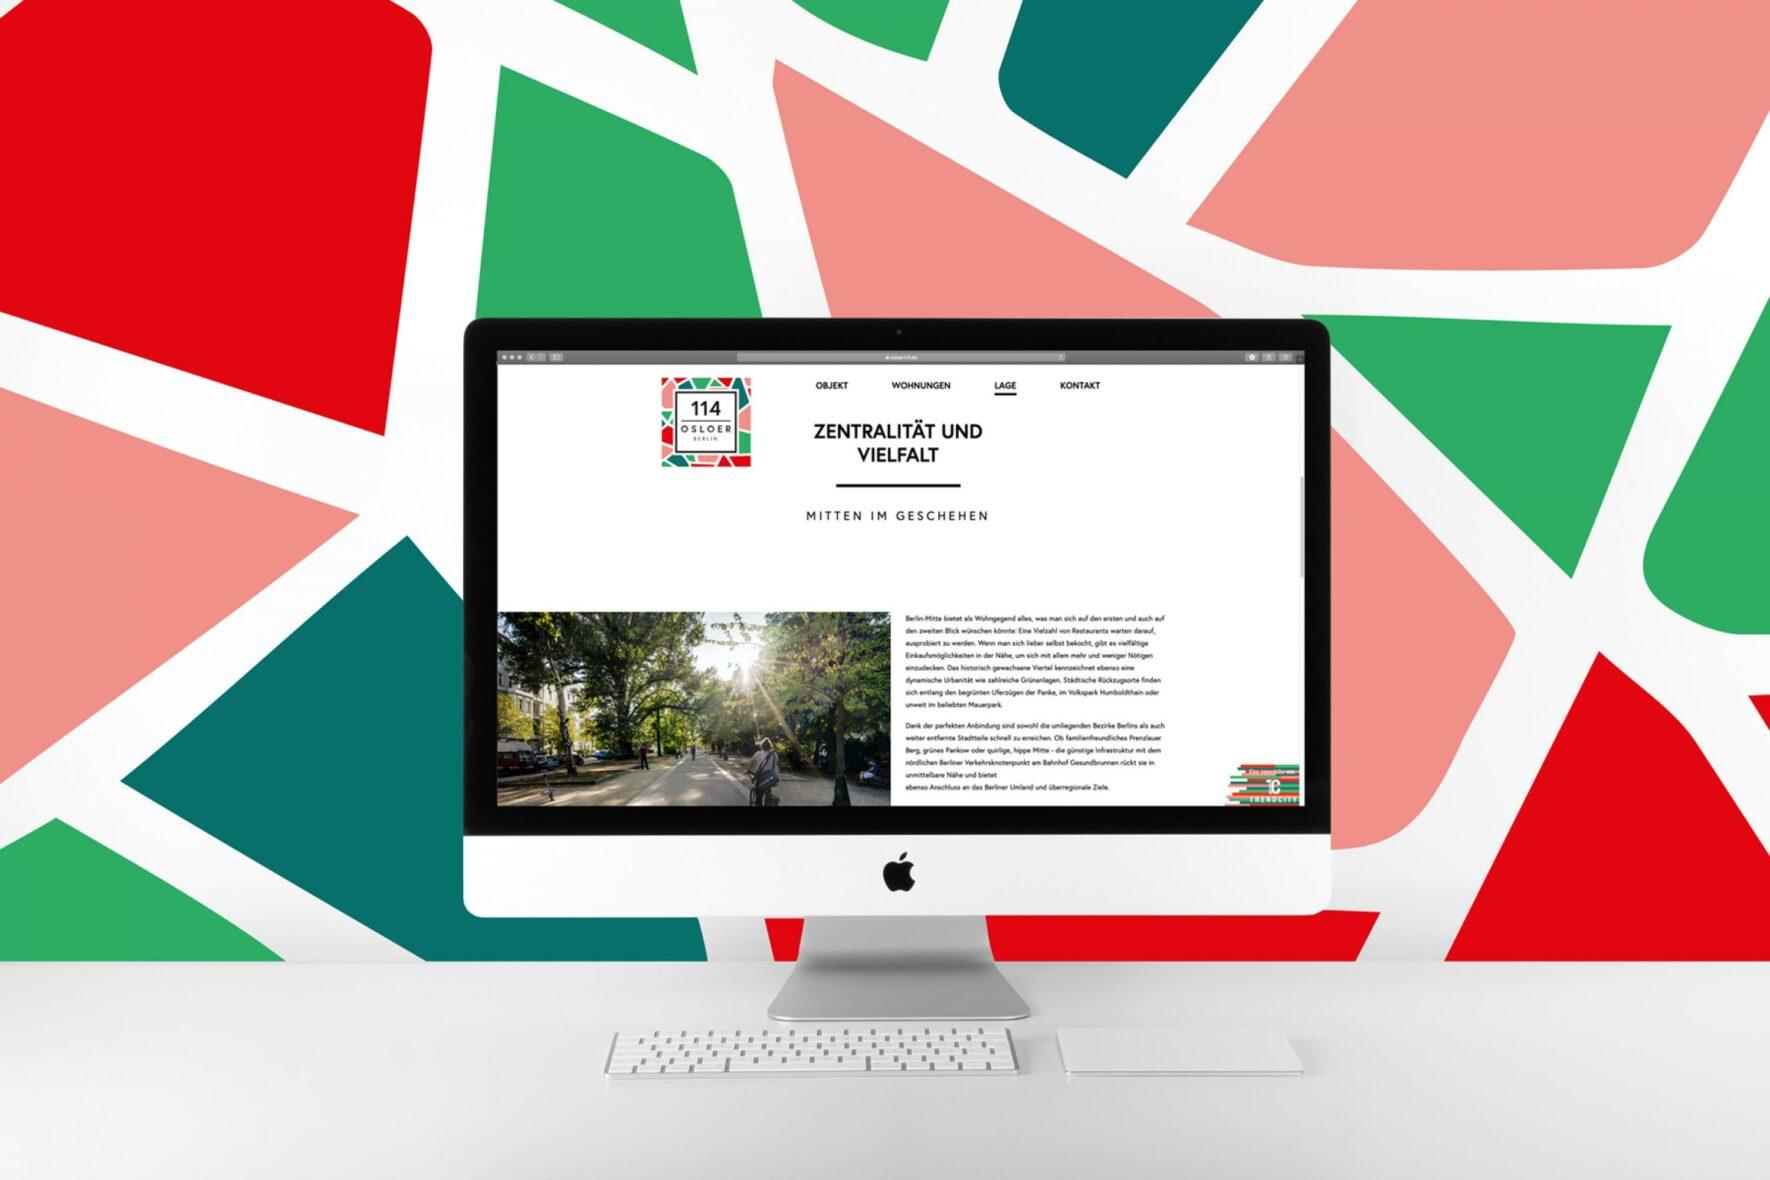 Webdesign-Osloer114-Trendcity-Immobilien-FORMLOS-Berlin-Design-6